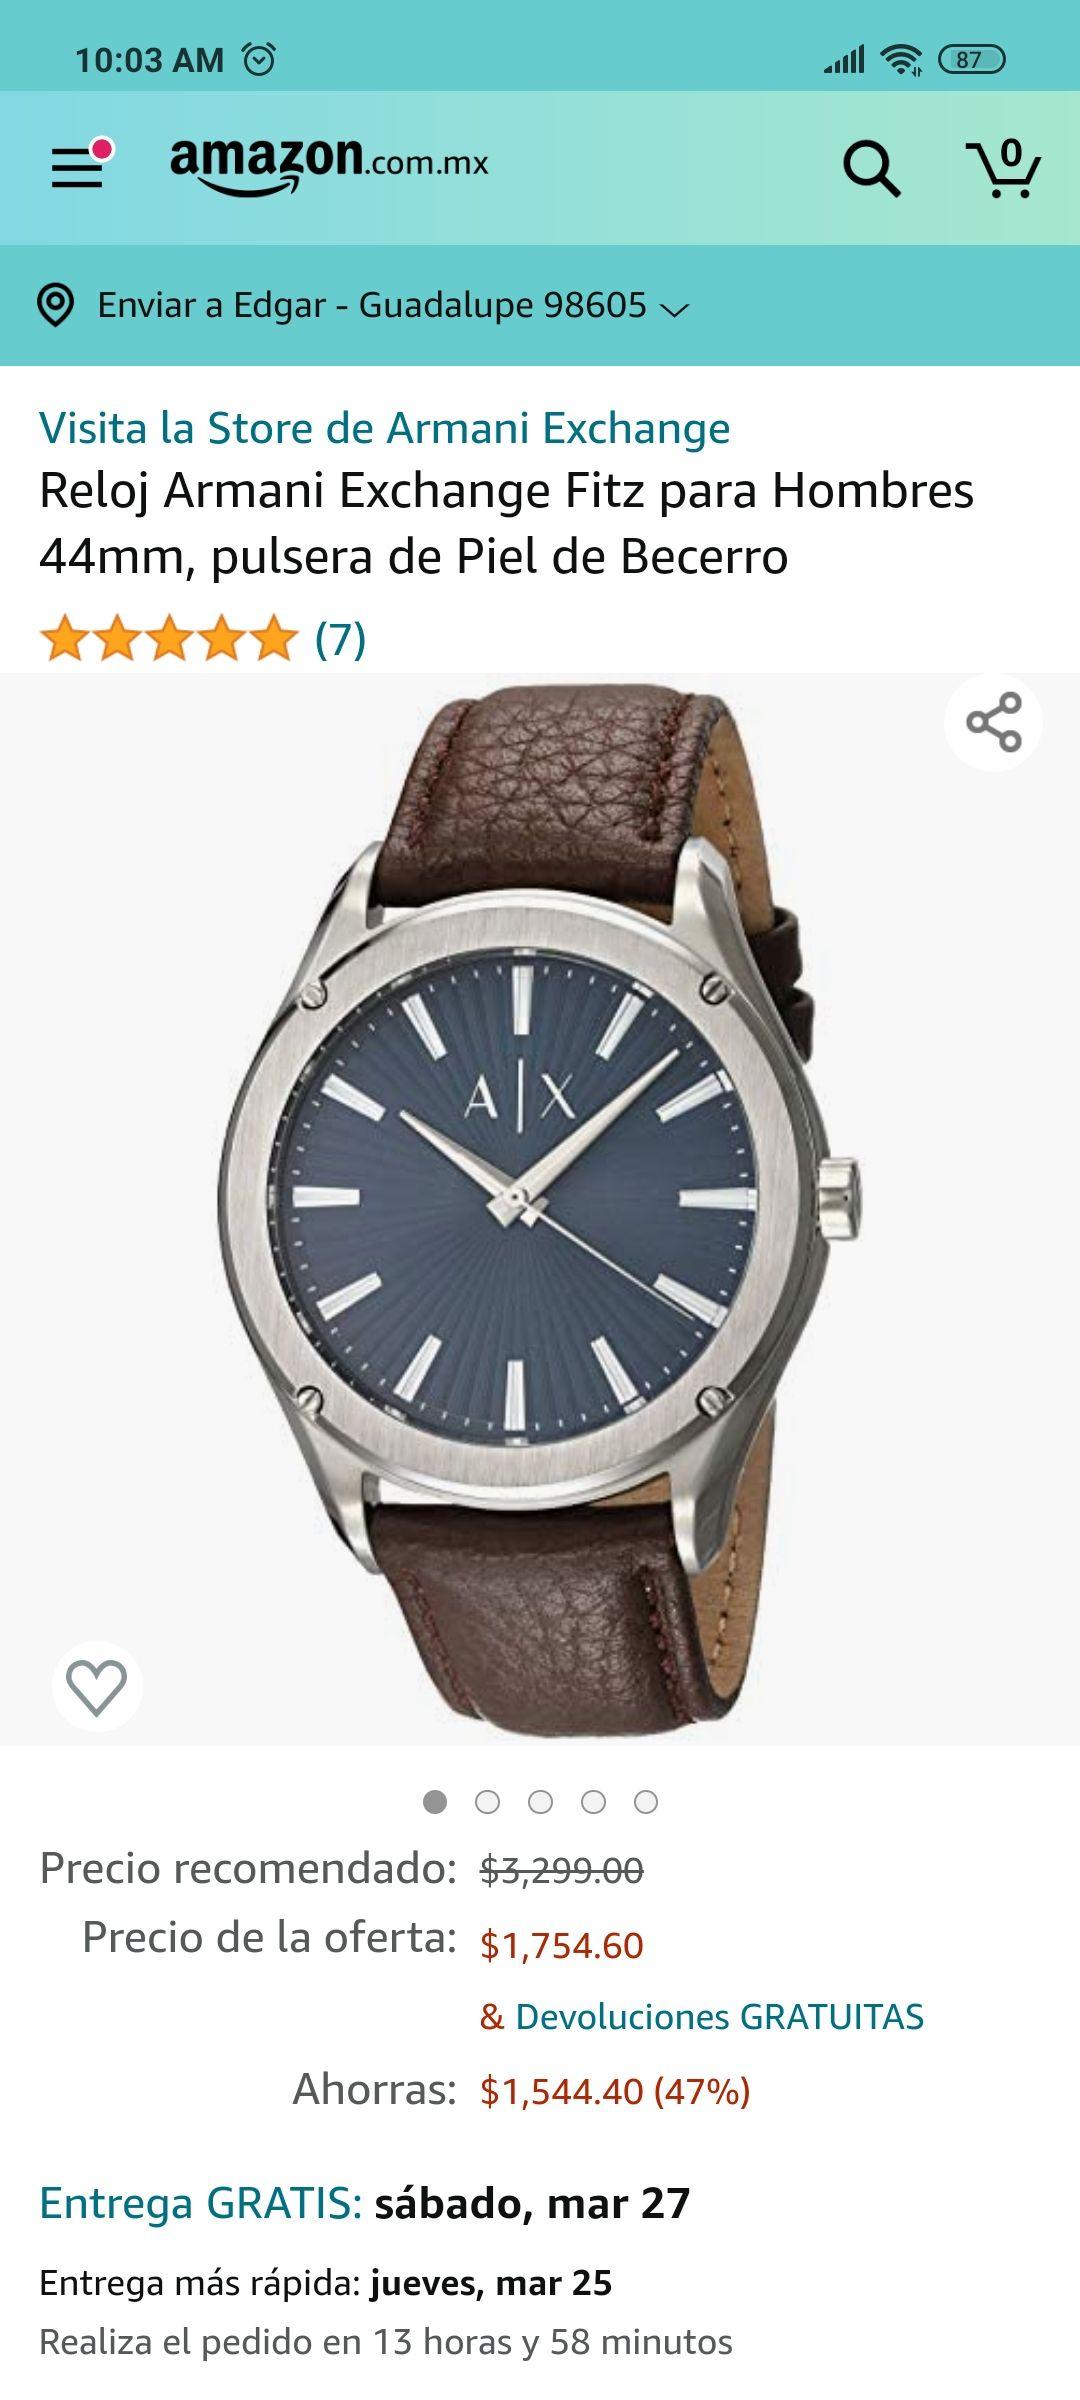 Amazon: Reloj Armani Exchange Fitz para Hombres 44mm